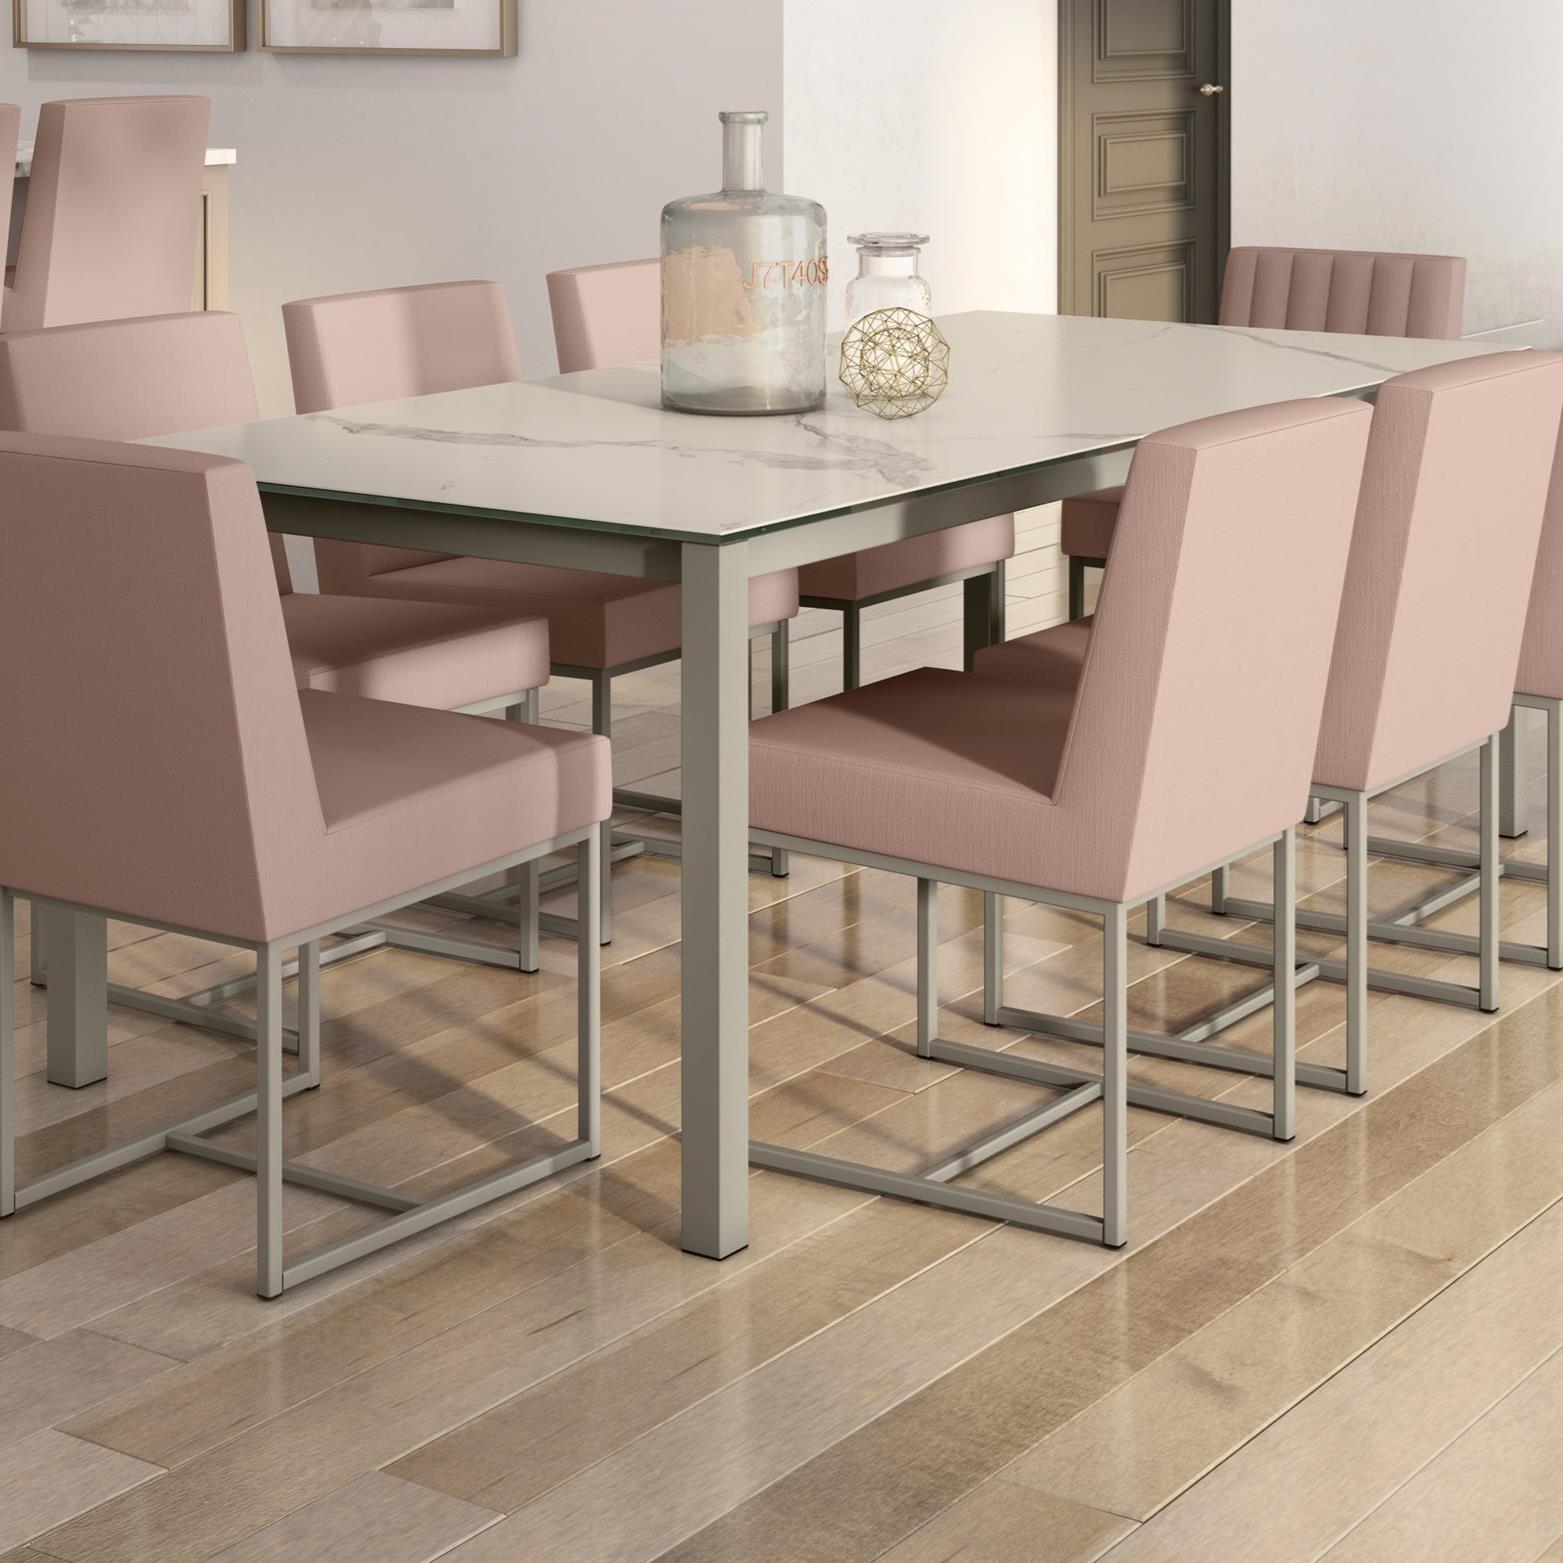 Boudoir Nicholson Table by Amisco at Jordan's Home Furnishings